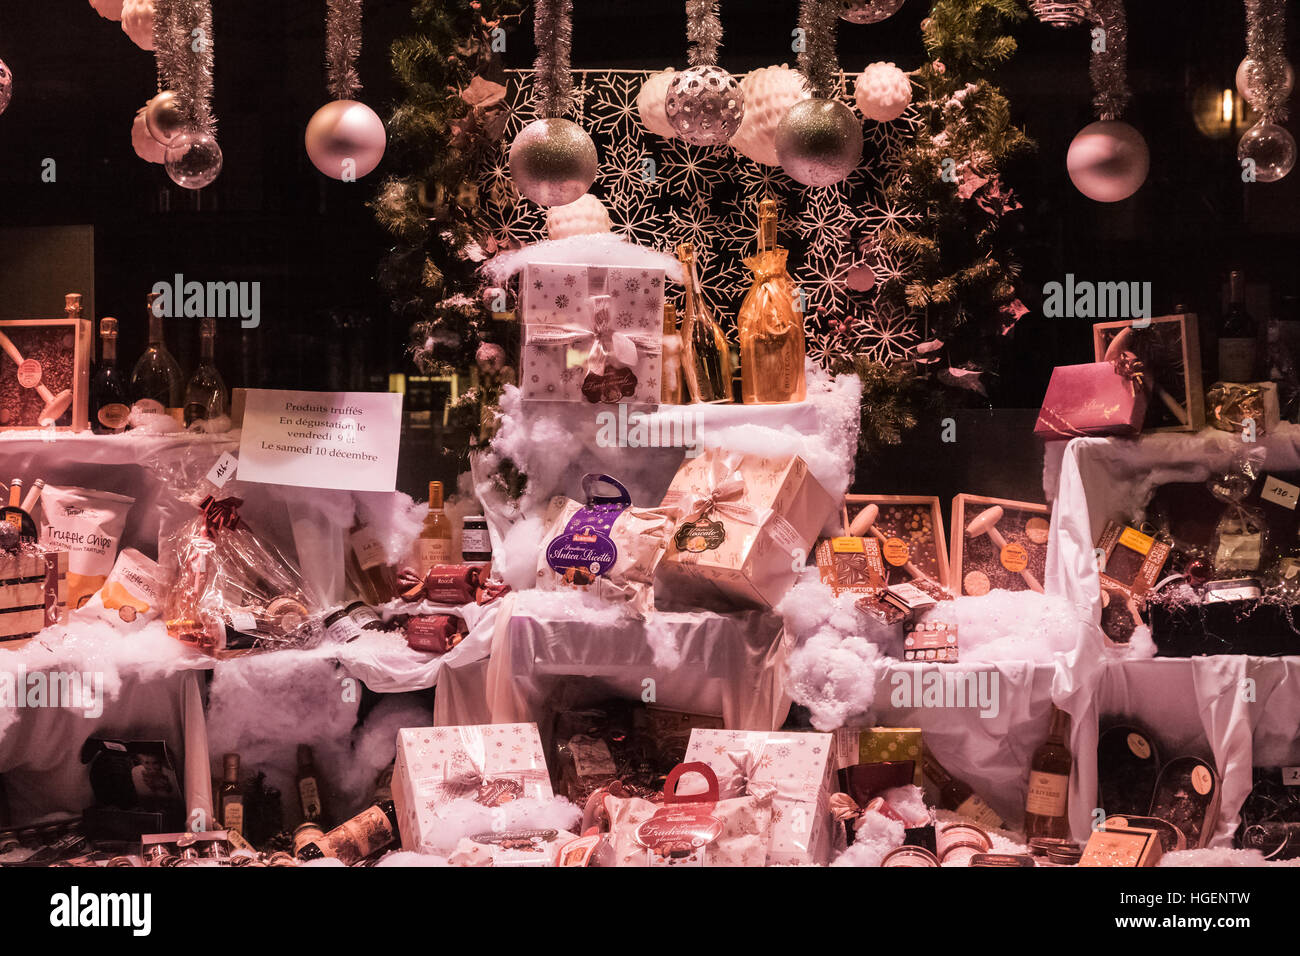 Festive Christmas Window Display Imágenes De Stock & Festive ...